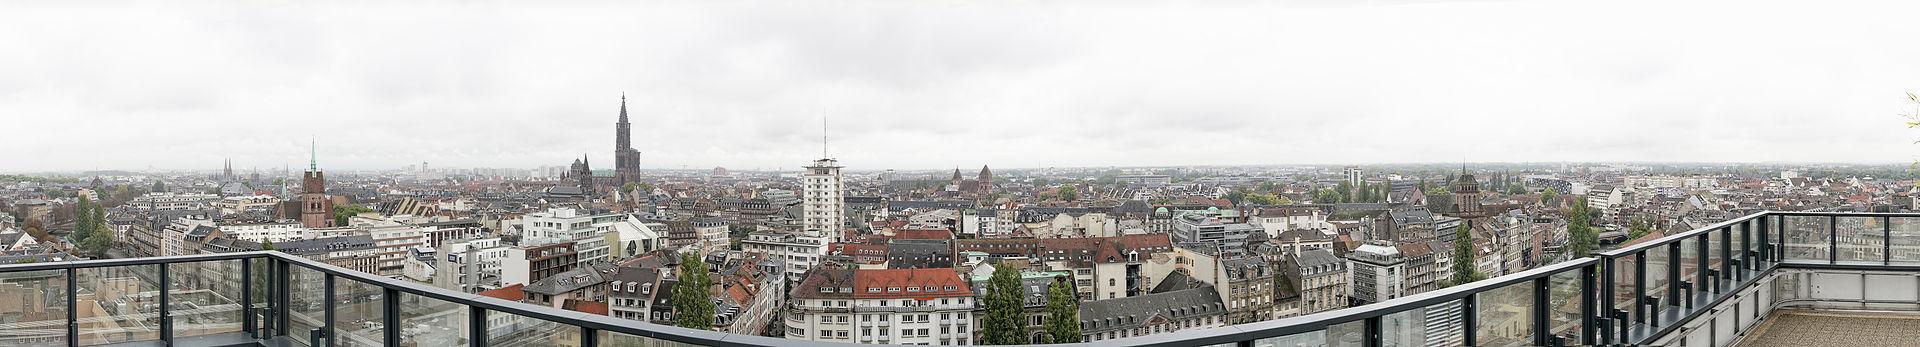 Strasbourg seen from Esca Tower in 2014.jpg